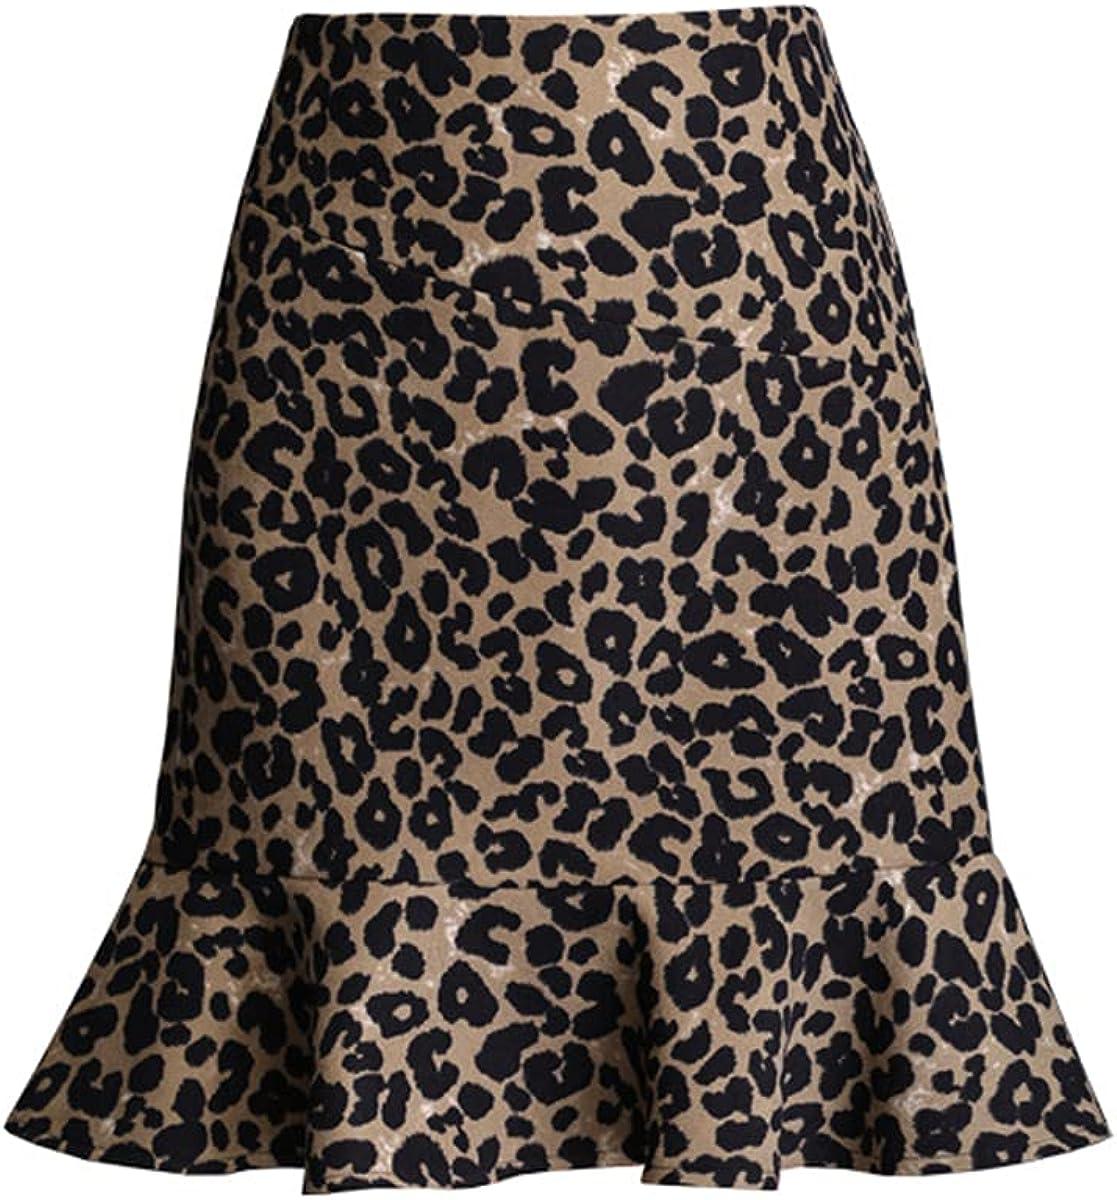 ATHX Women's Leopard Mermaid High Waist Mini Skirt